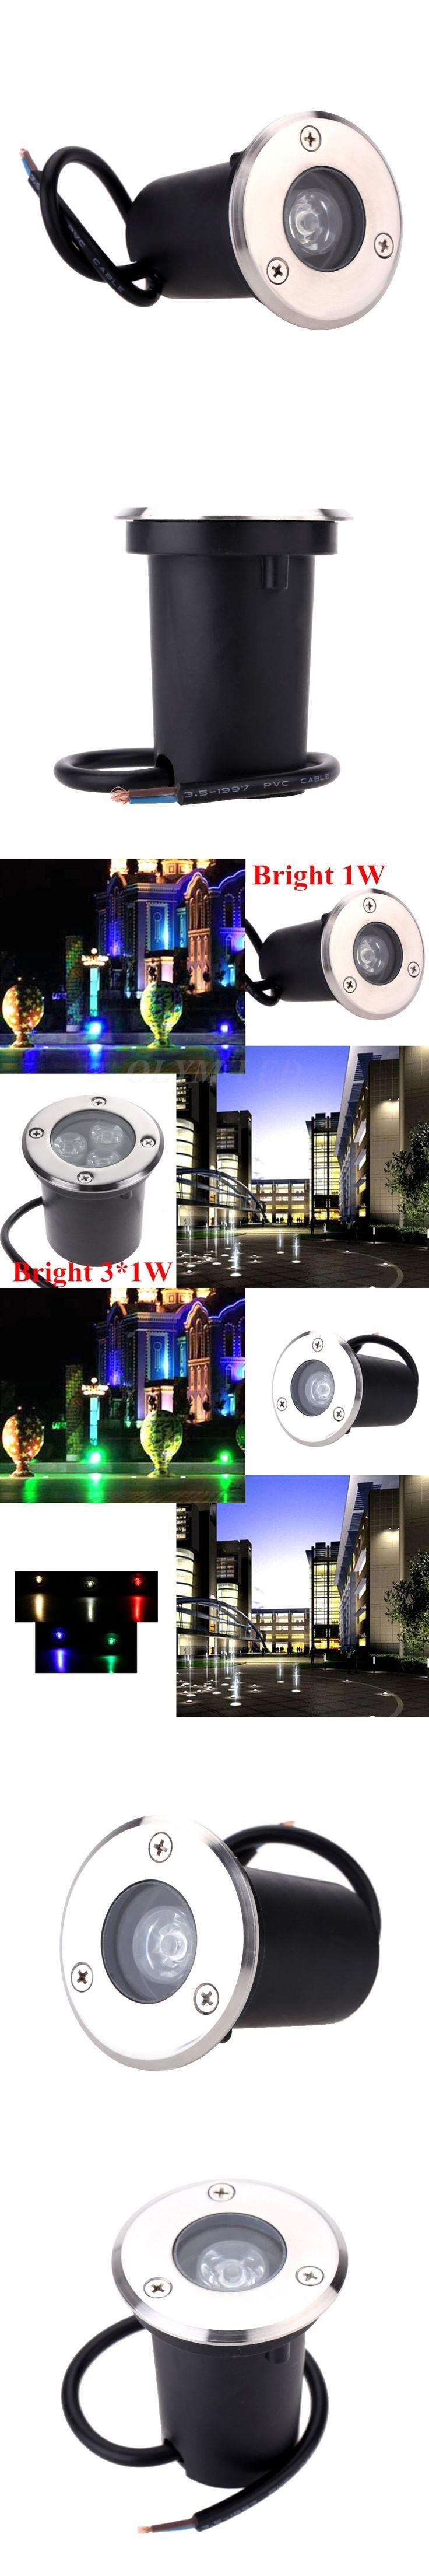 Best Waterproof Outdoor LED Underground Lamp 1W 3W Outdoor Garden Lighting 220V 110V Path Buried Light Blubs Landscape Spotlight